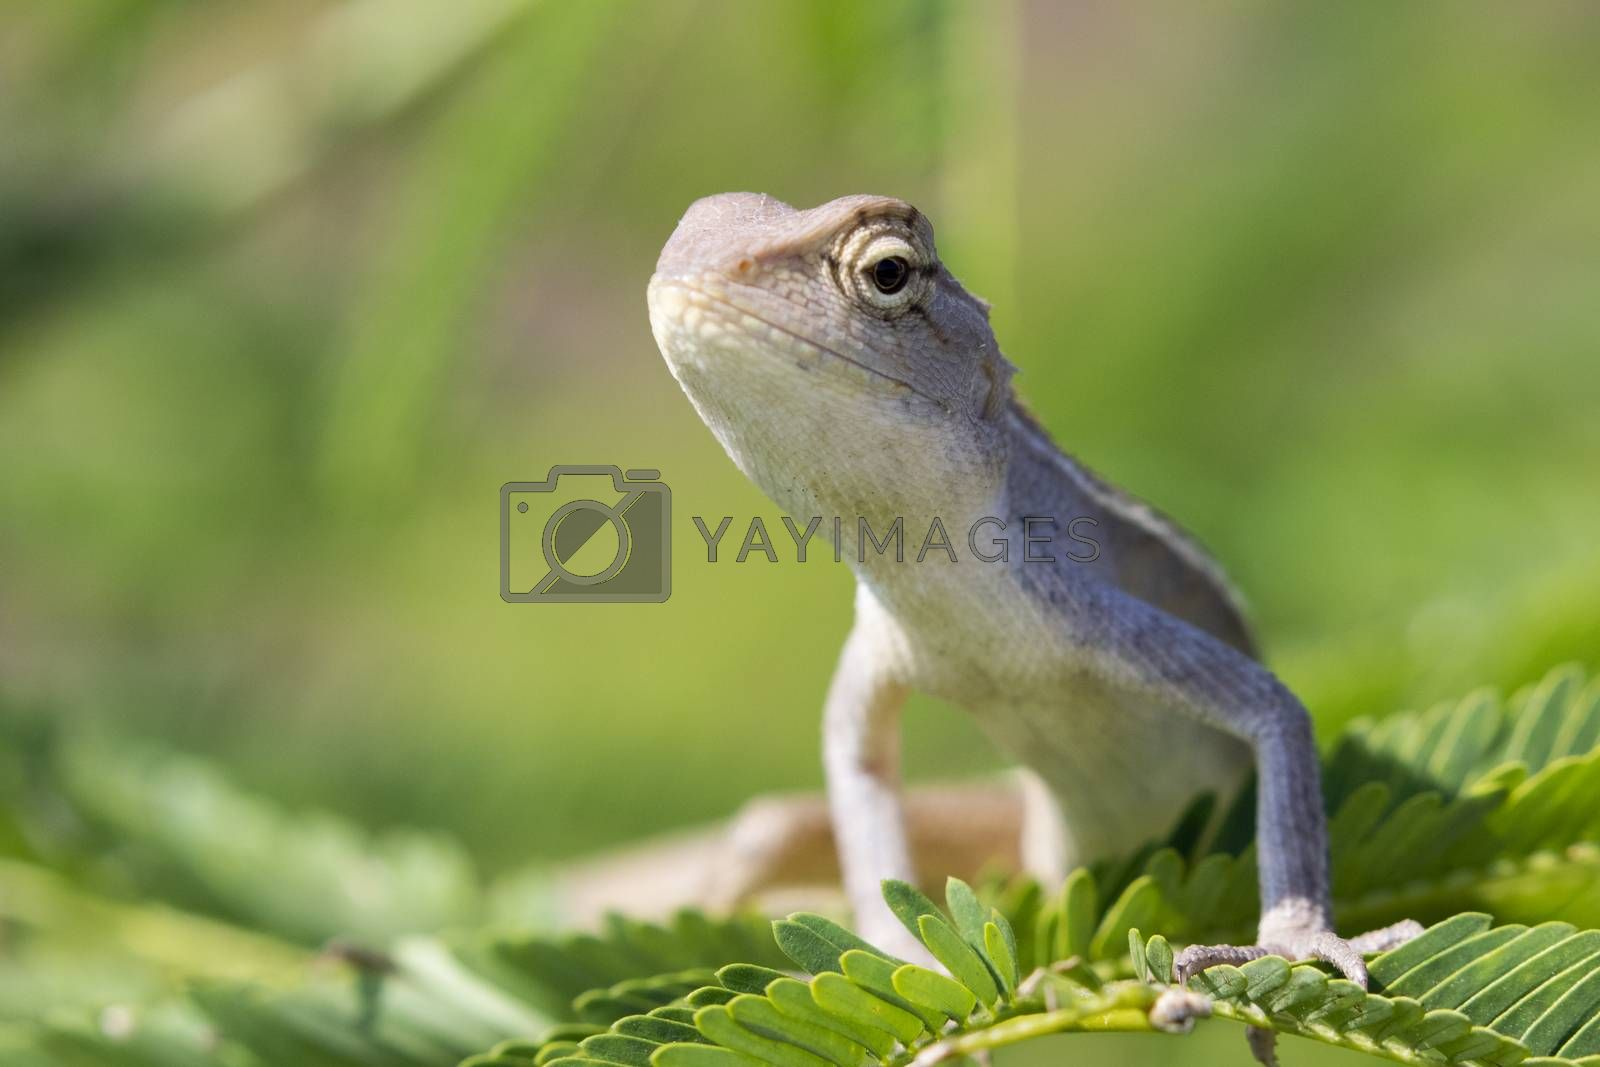 Image of chameleon on nature background.